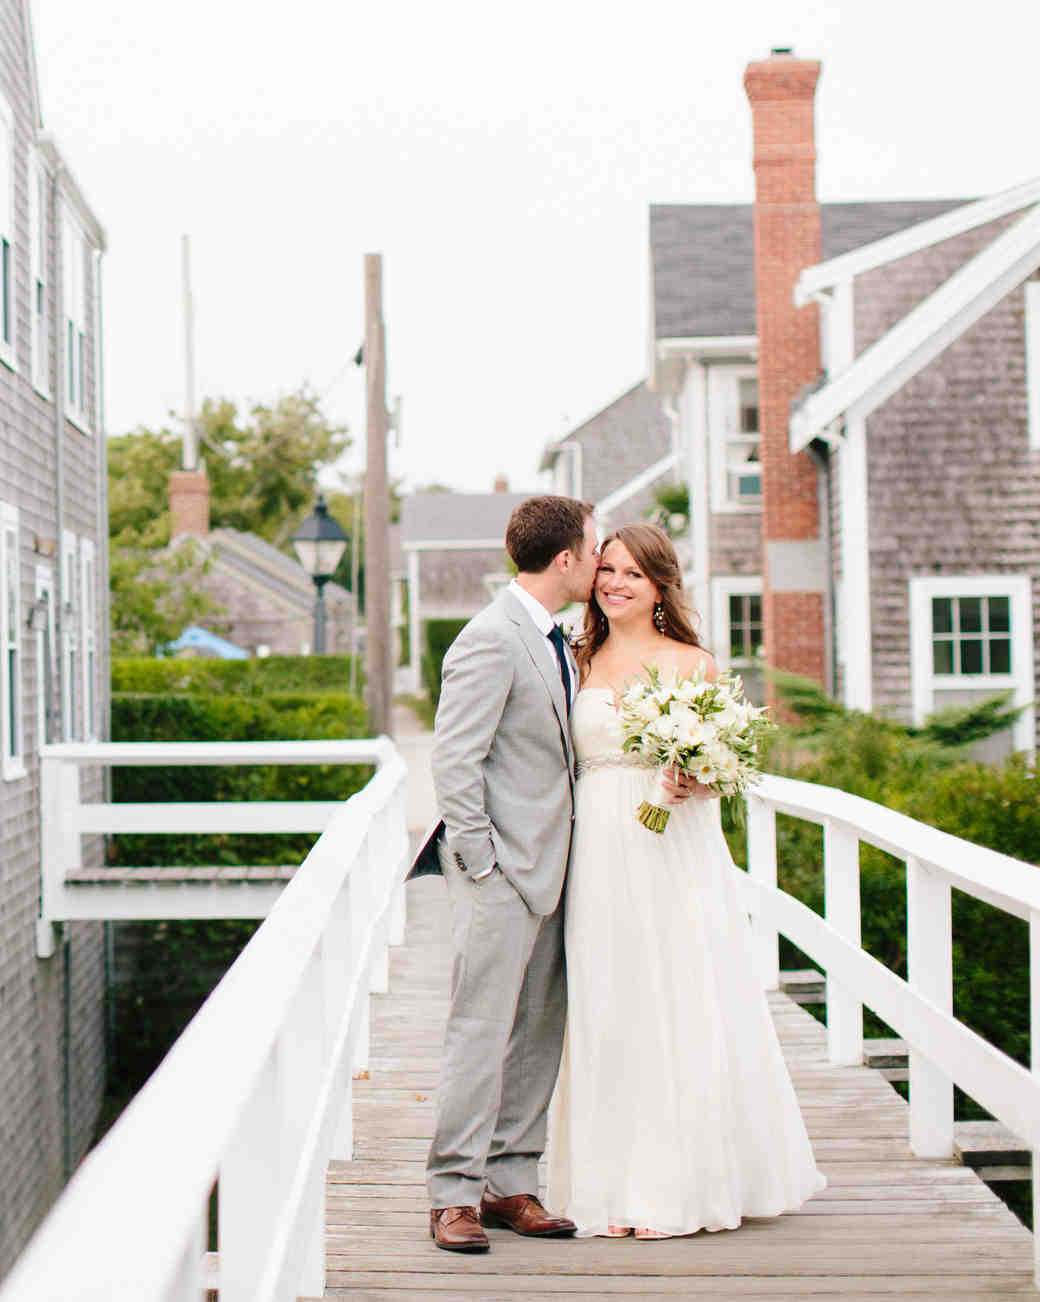 kristen-jonathan-wedding-couple-1105-s112193-1015.jpg